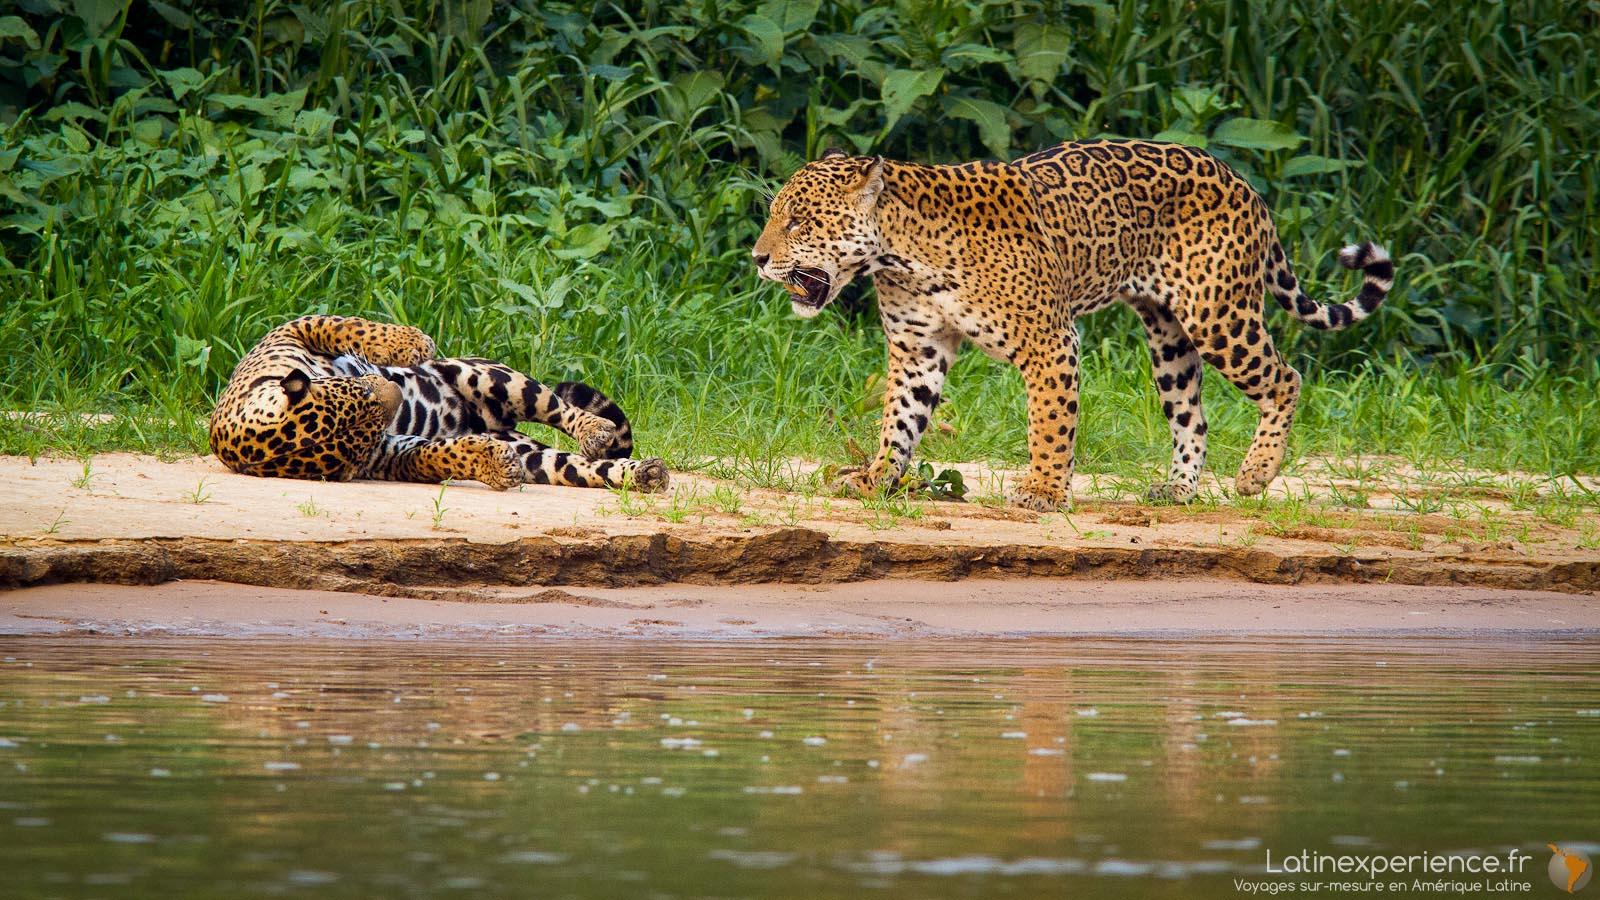 Bresil - Pantanal - Jaguar - Latinexperience voyages